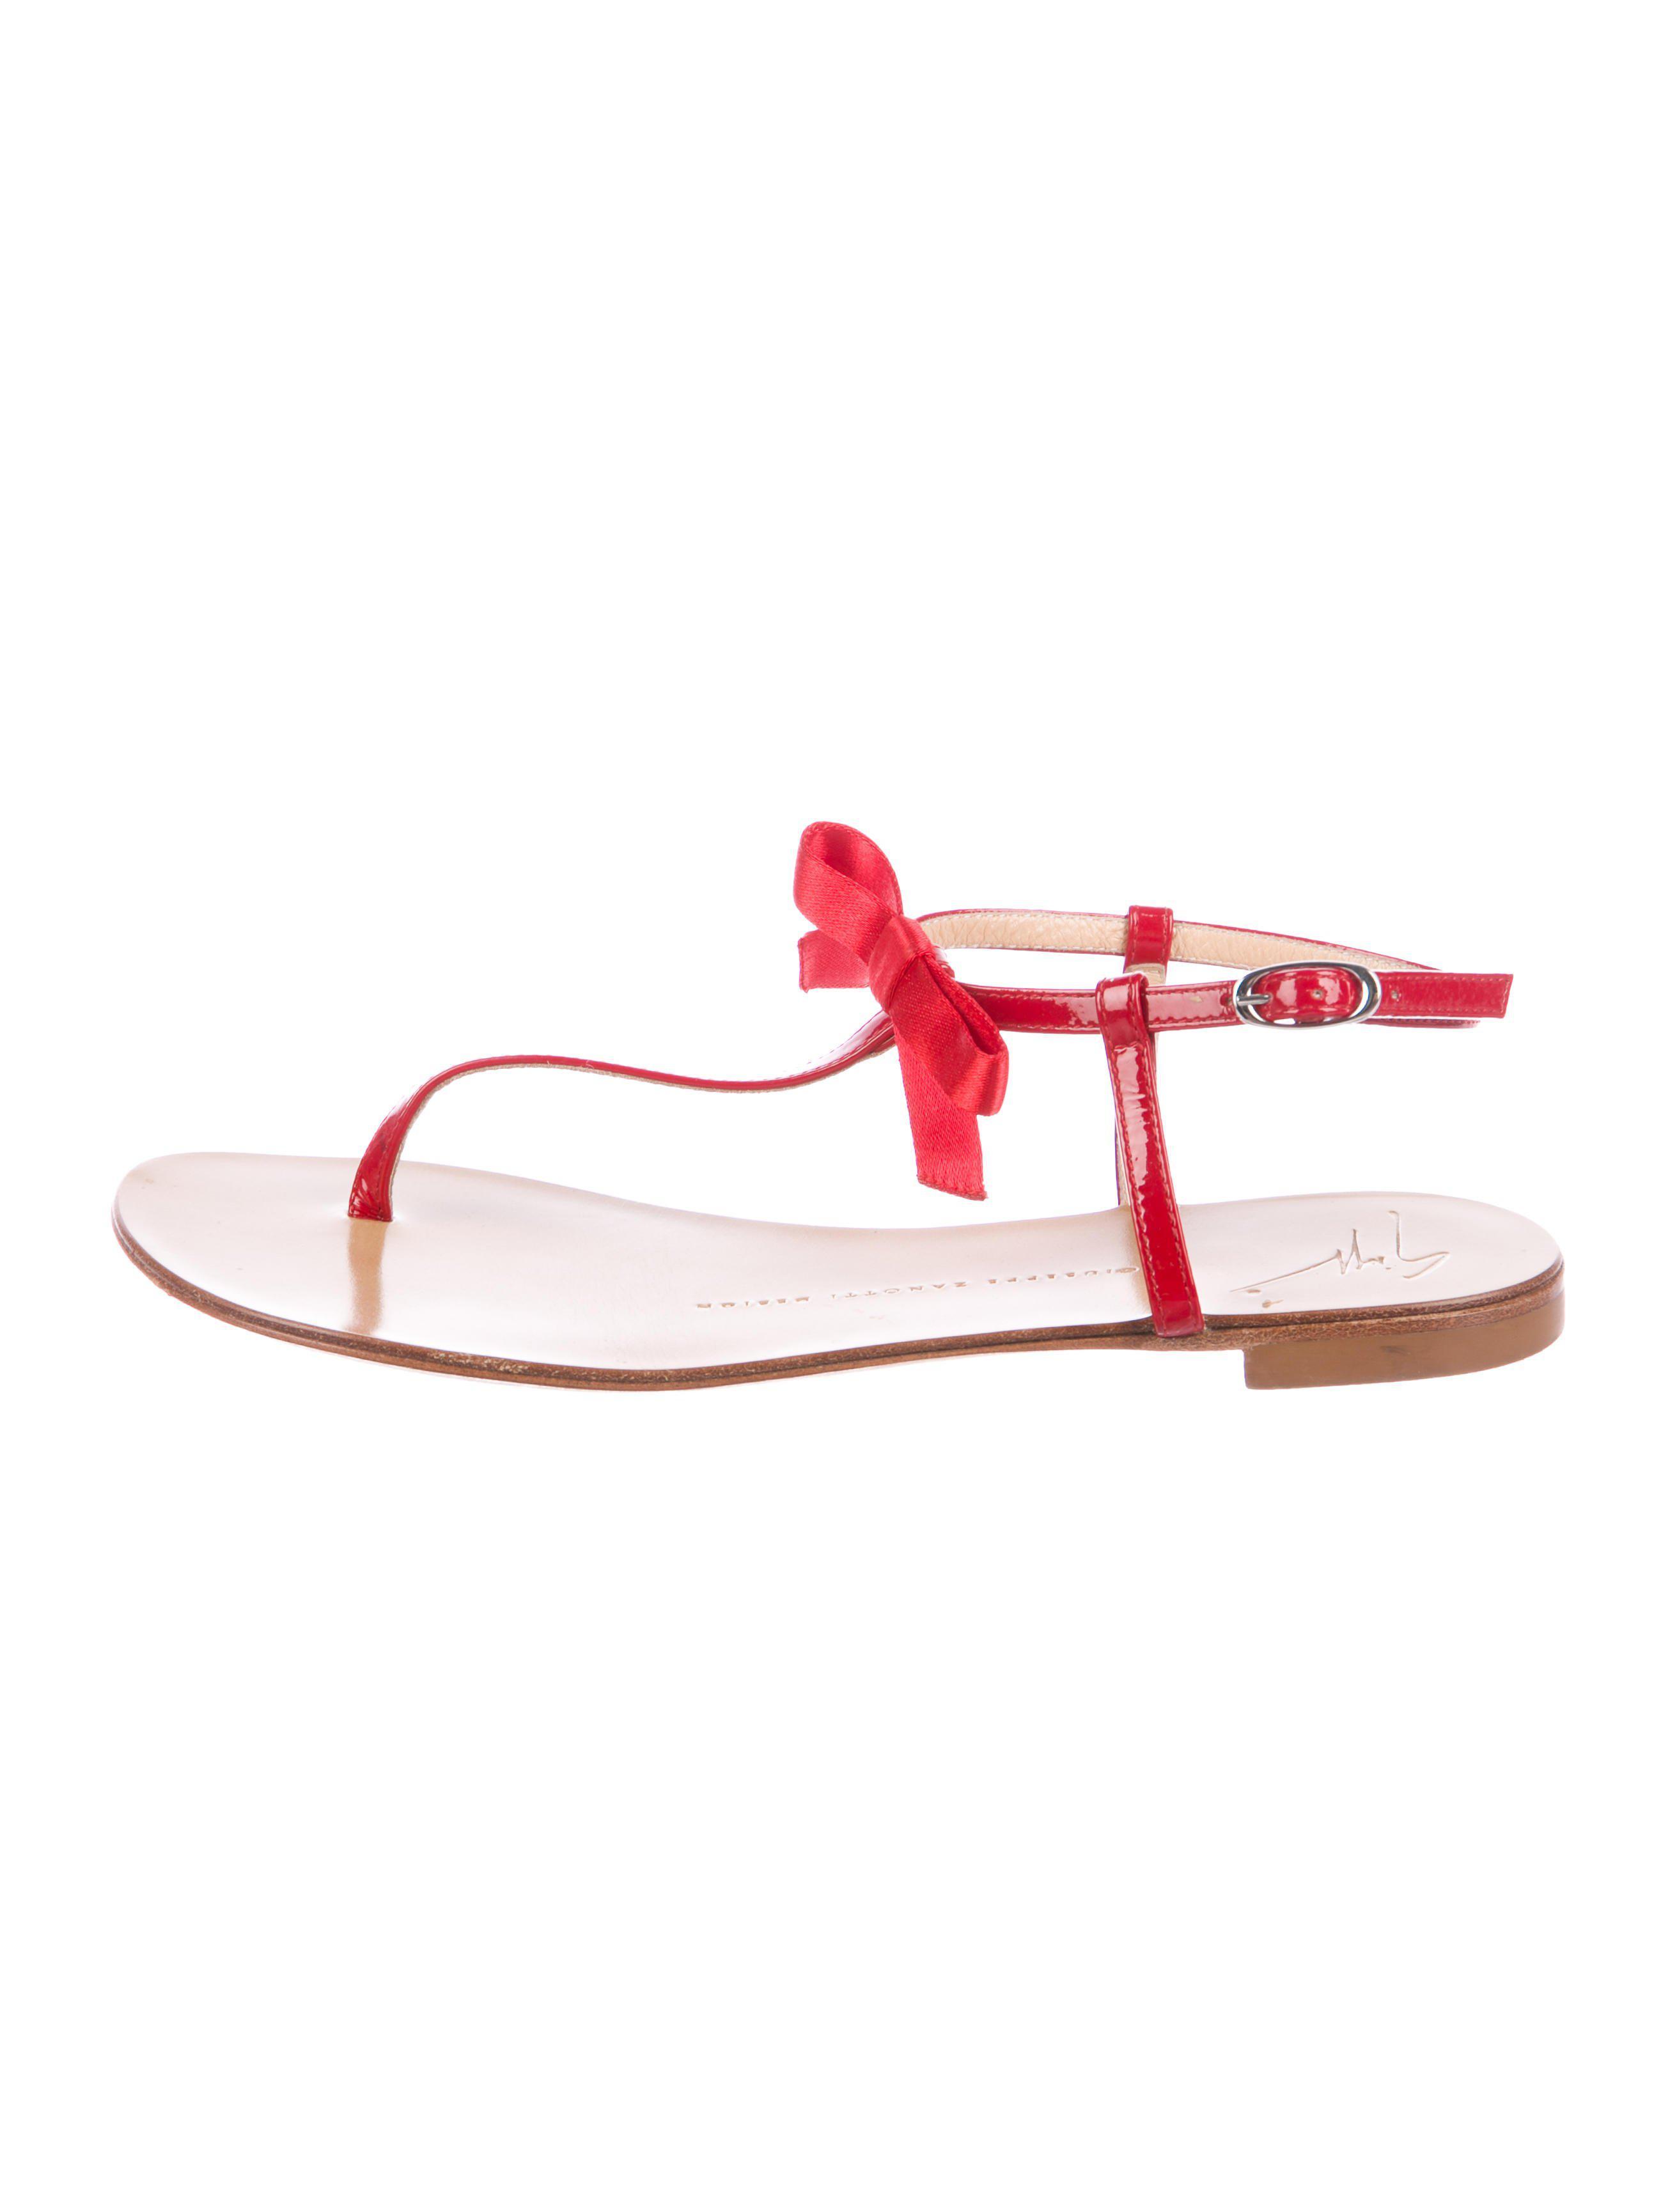 3b7491fb195e Giuseppe Zanotti - Red Bow Thong Sandals - Lyst. View fullscreen